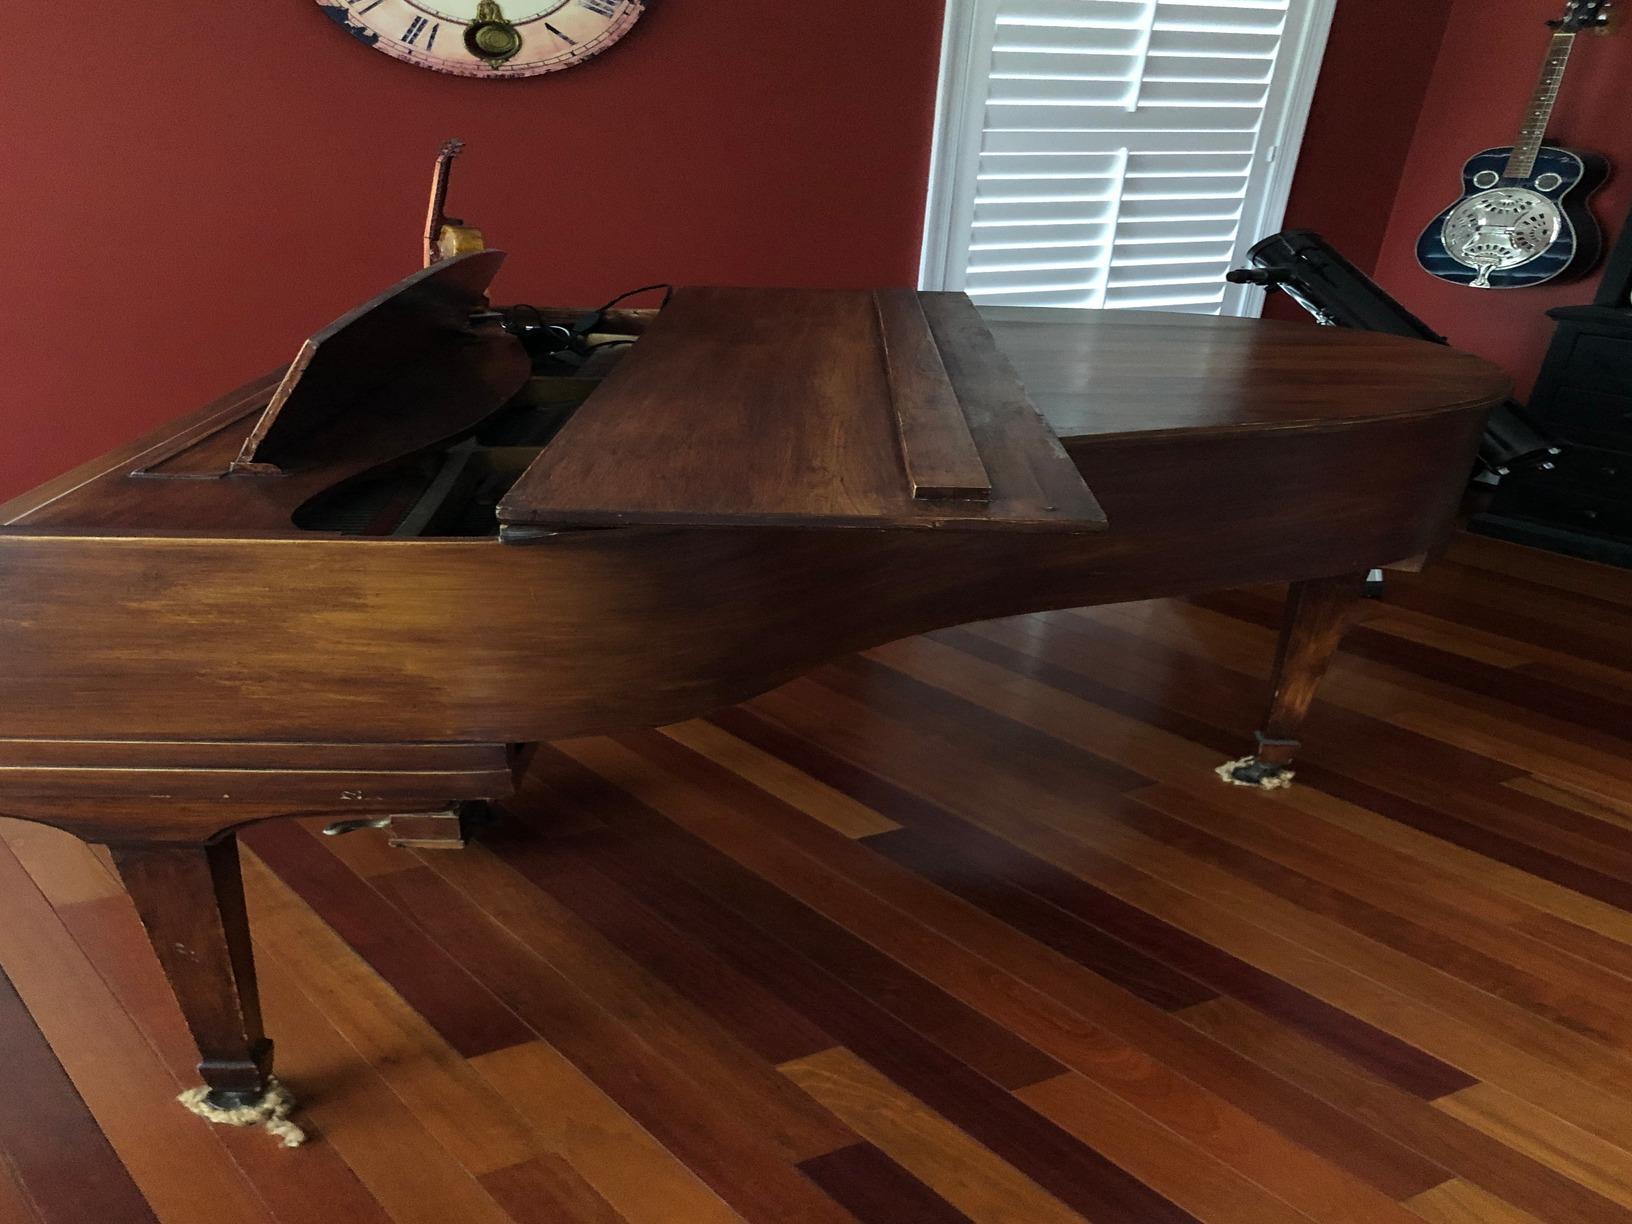 Baby Grand Piano Removal in Warrenton, VA - Before Photo